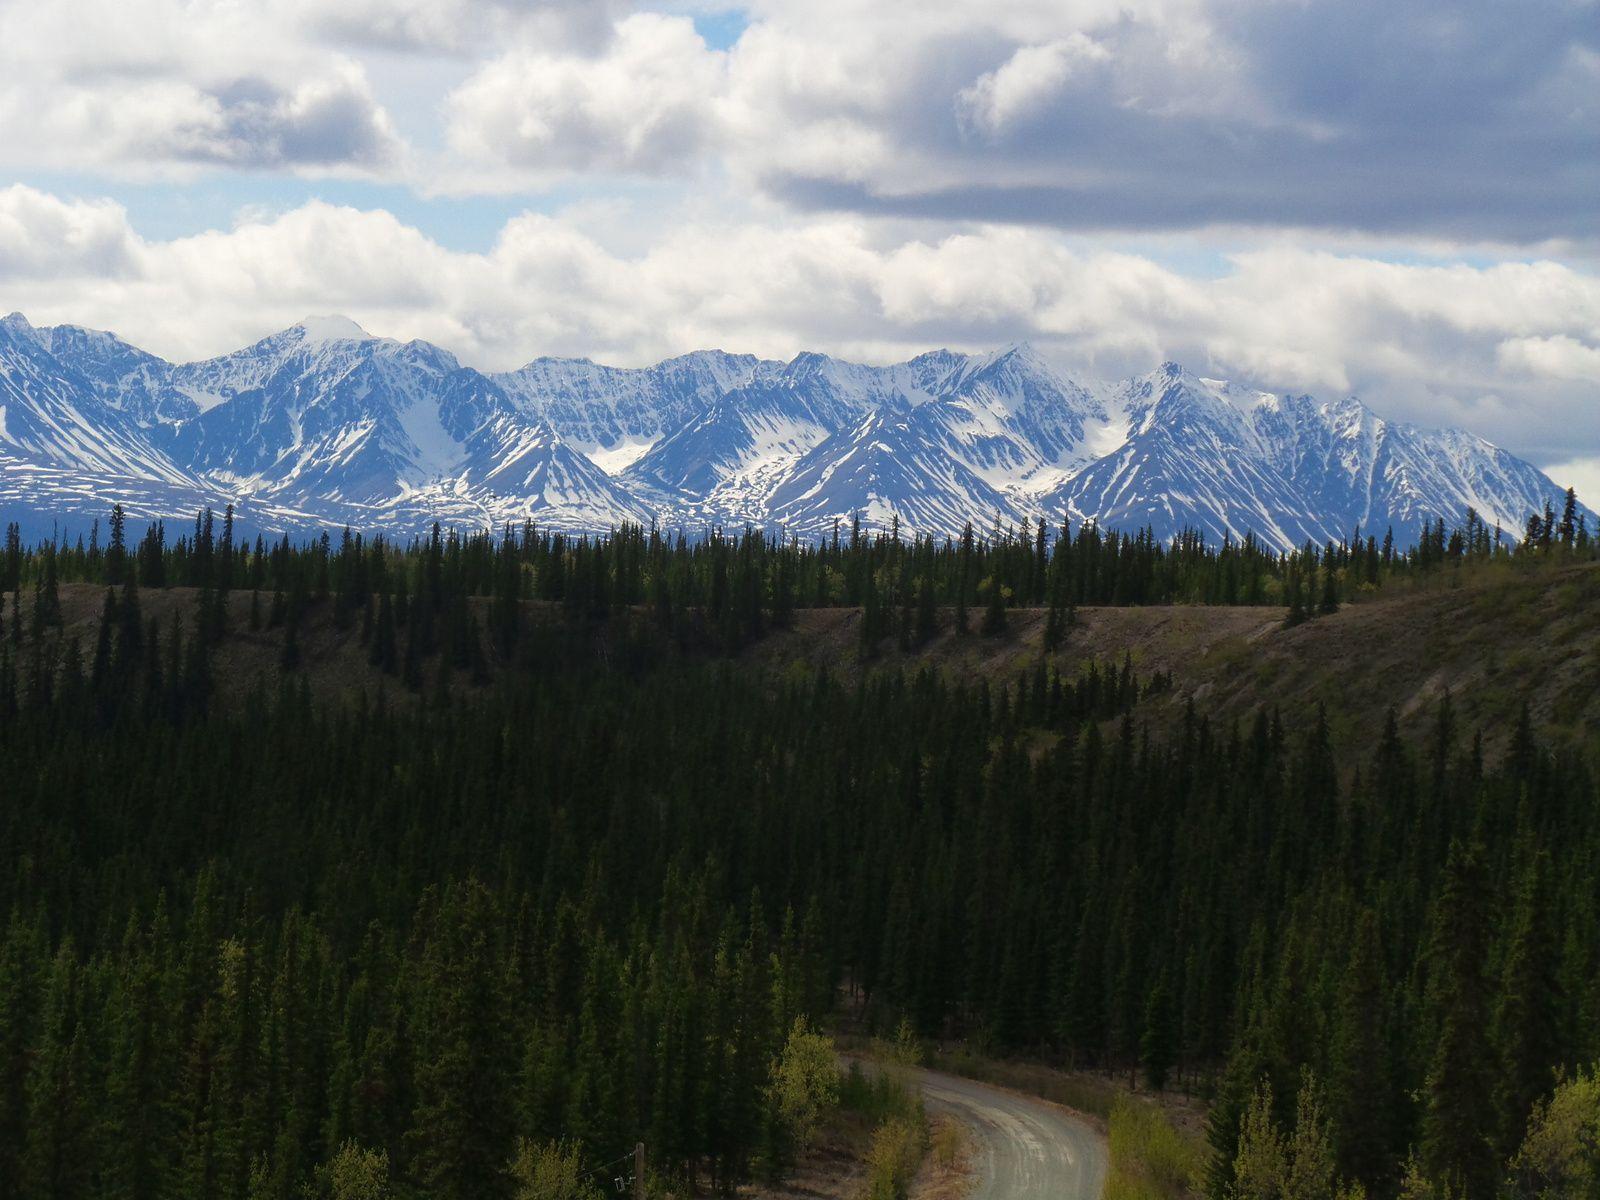 Bilan de mon épopée au Yukon